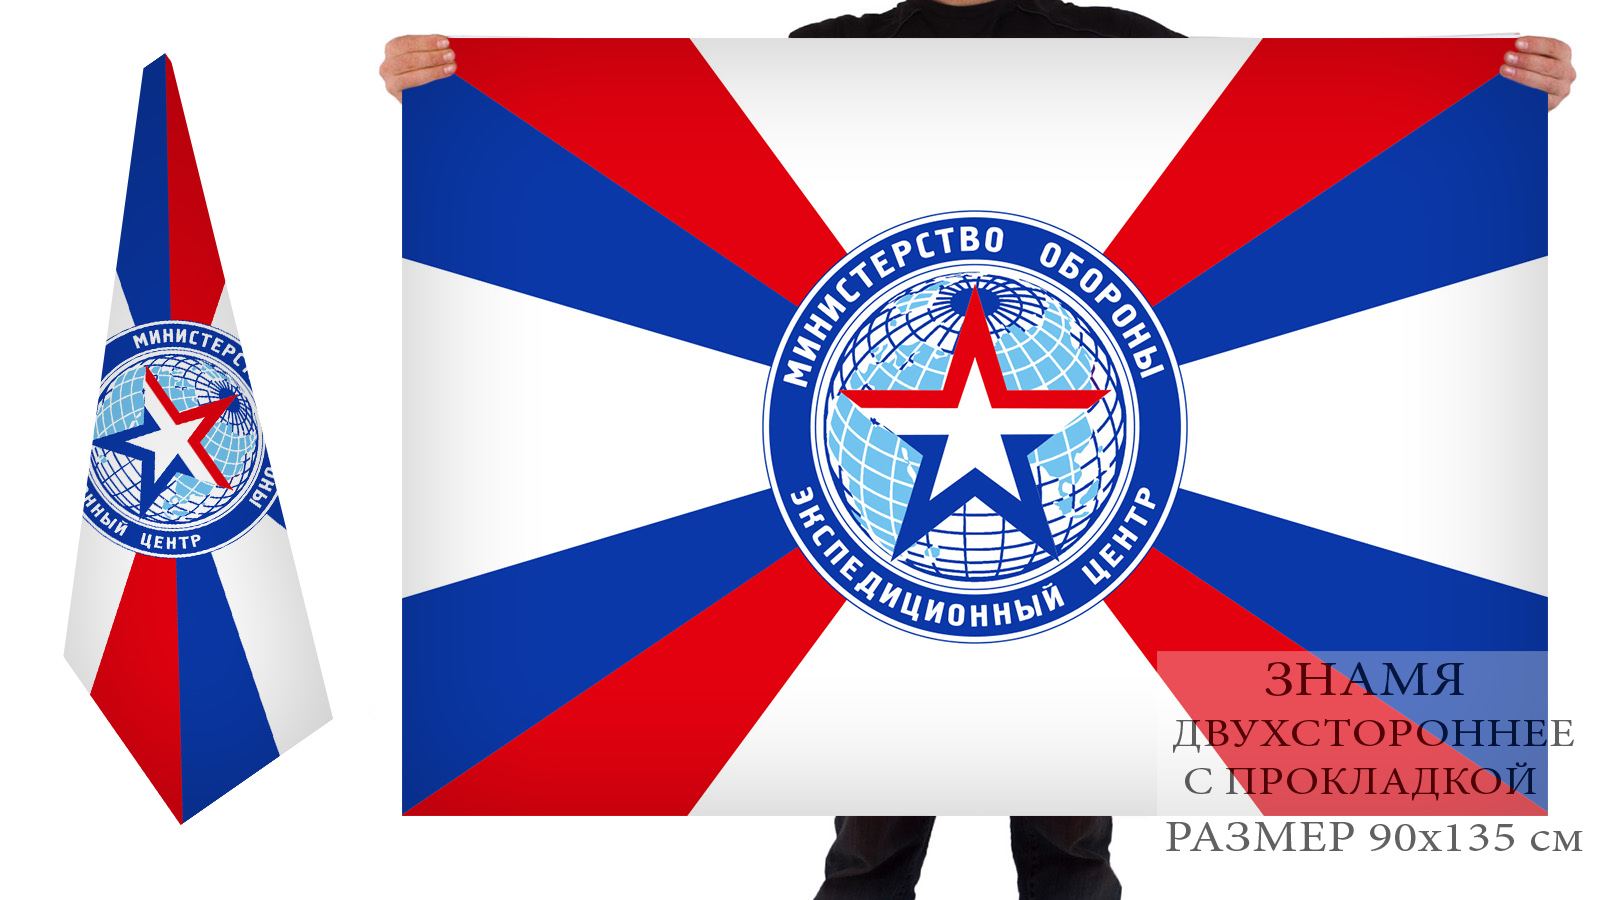 Двусторонний флаг Экспедиционного центра Министерства обороны